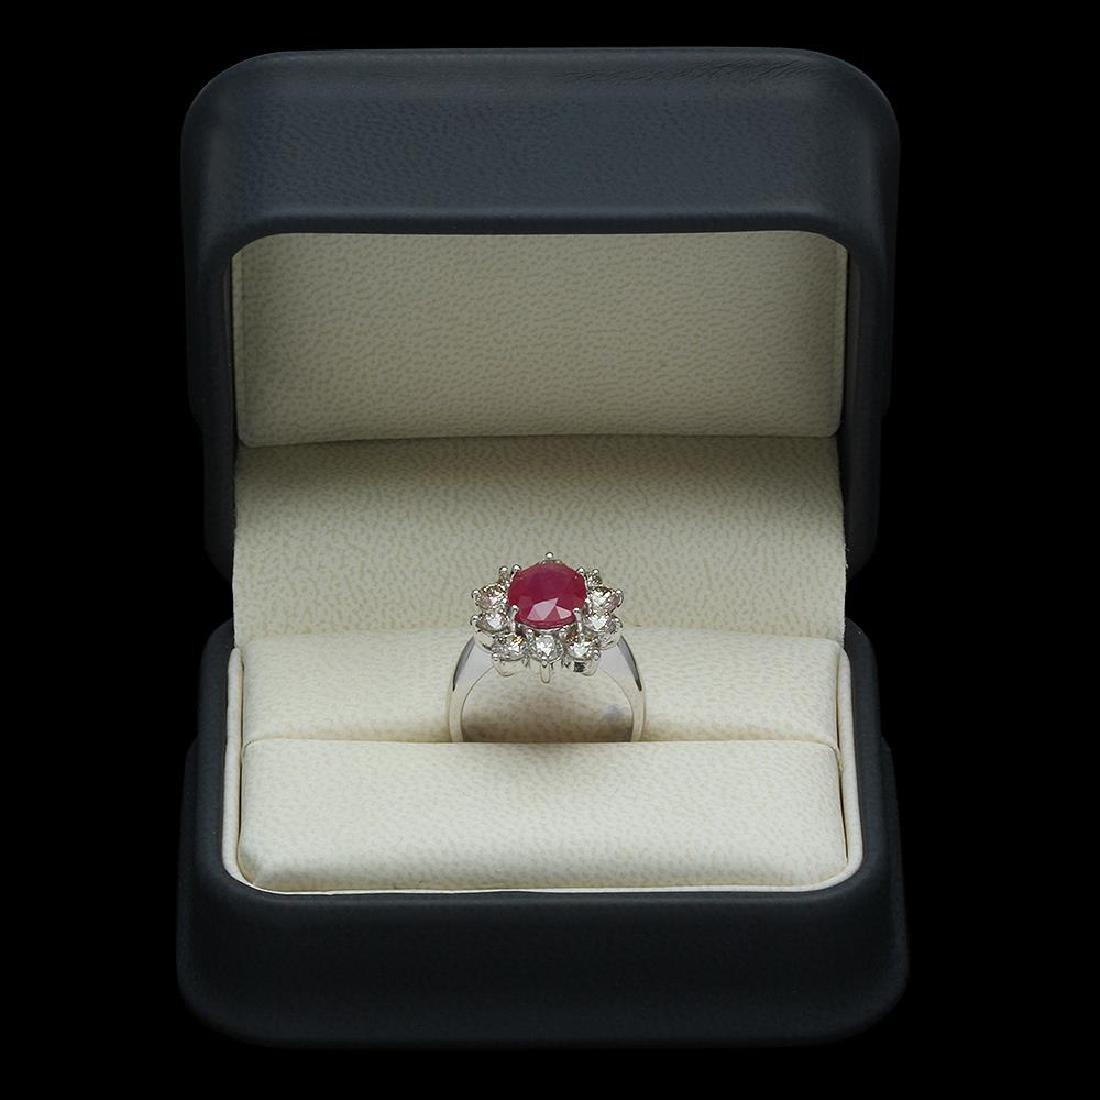 14K Gold 2.95ct Ruby & 2.20ct Diamond Ring - 4